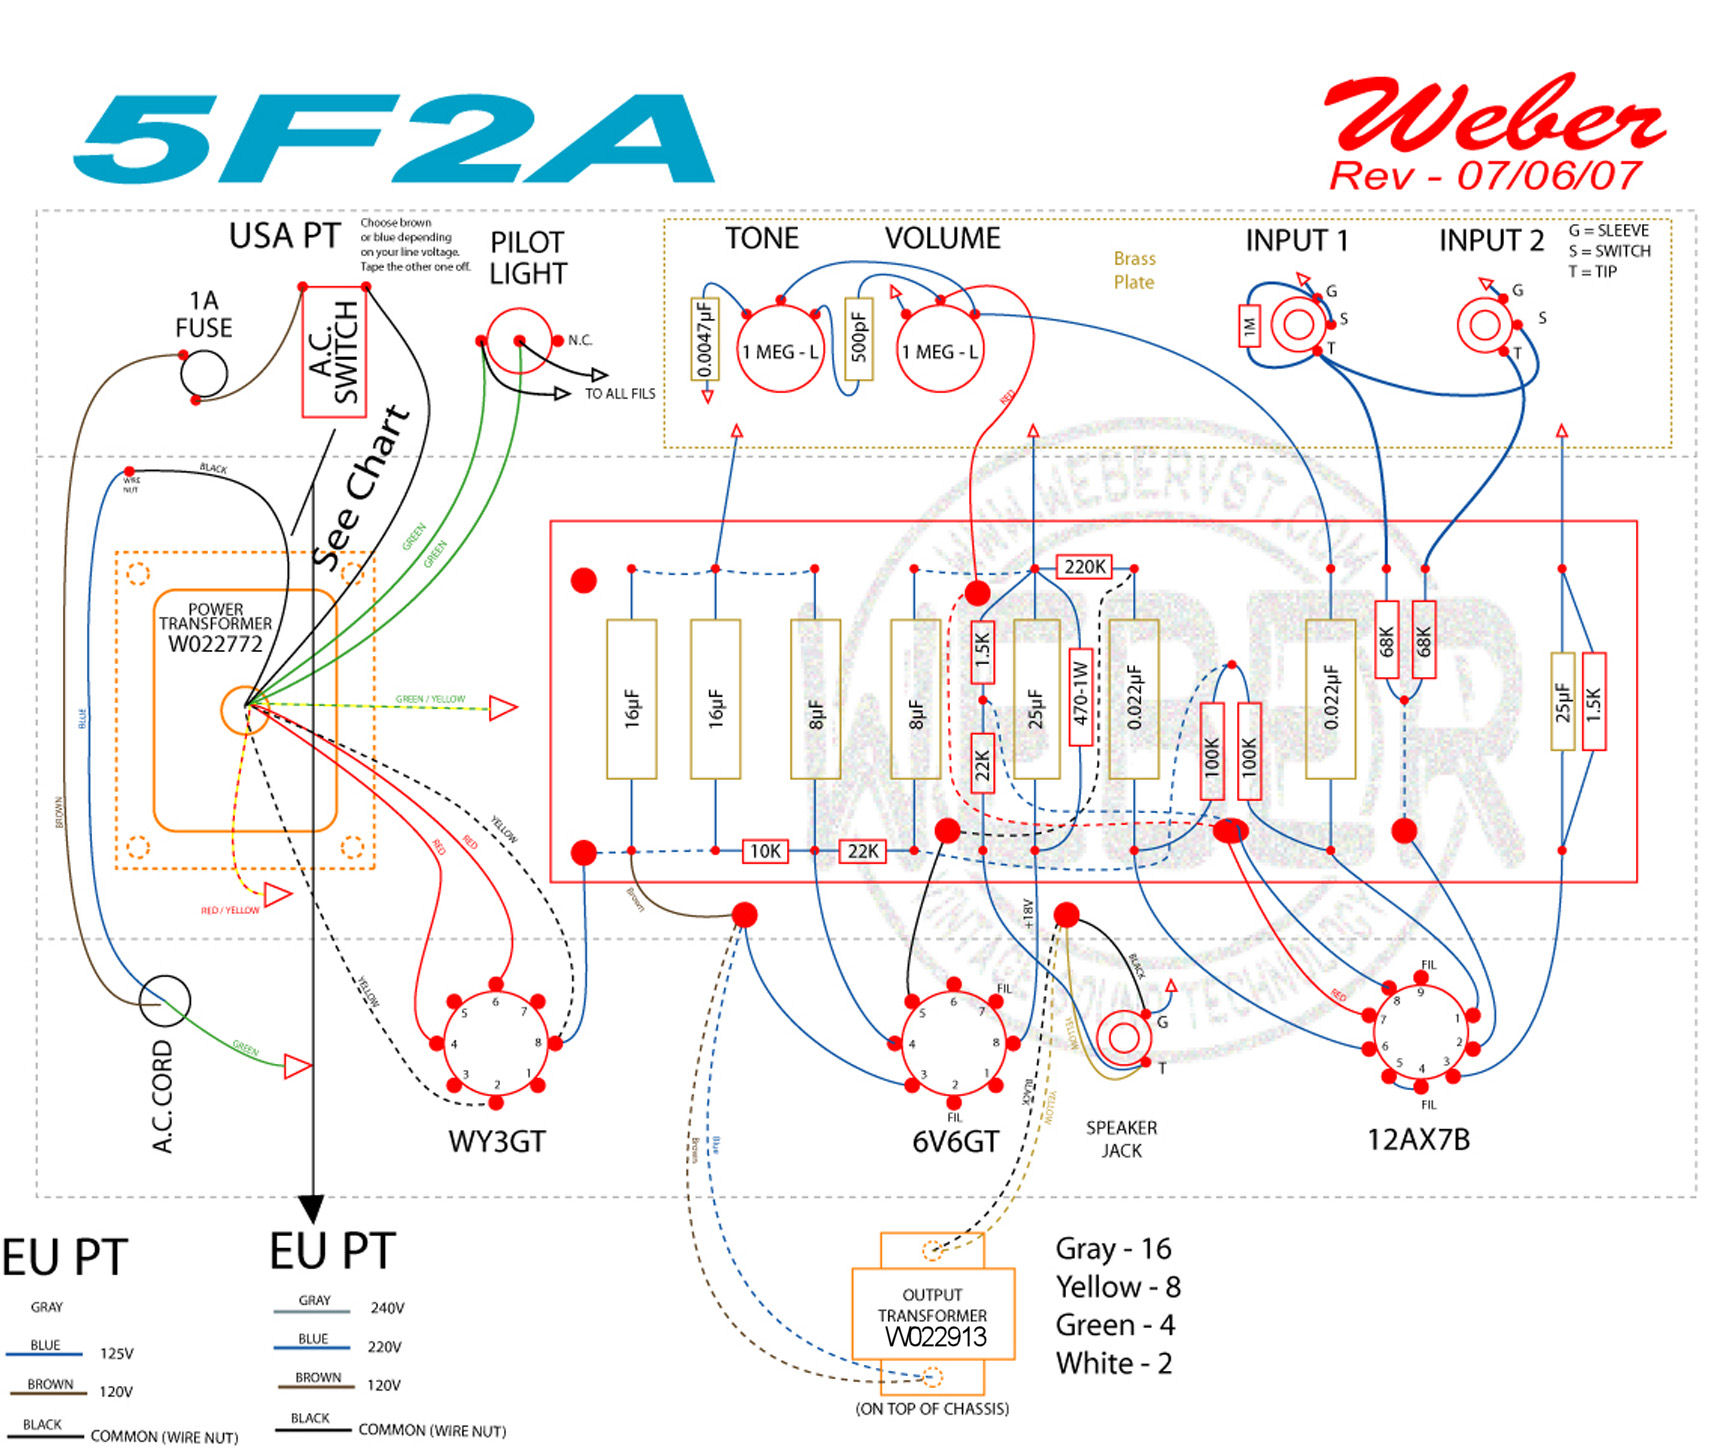 5f2a amp kit layout